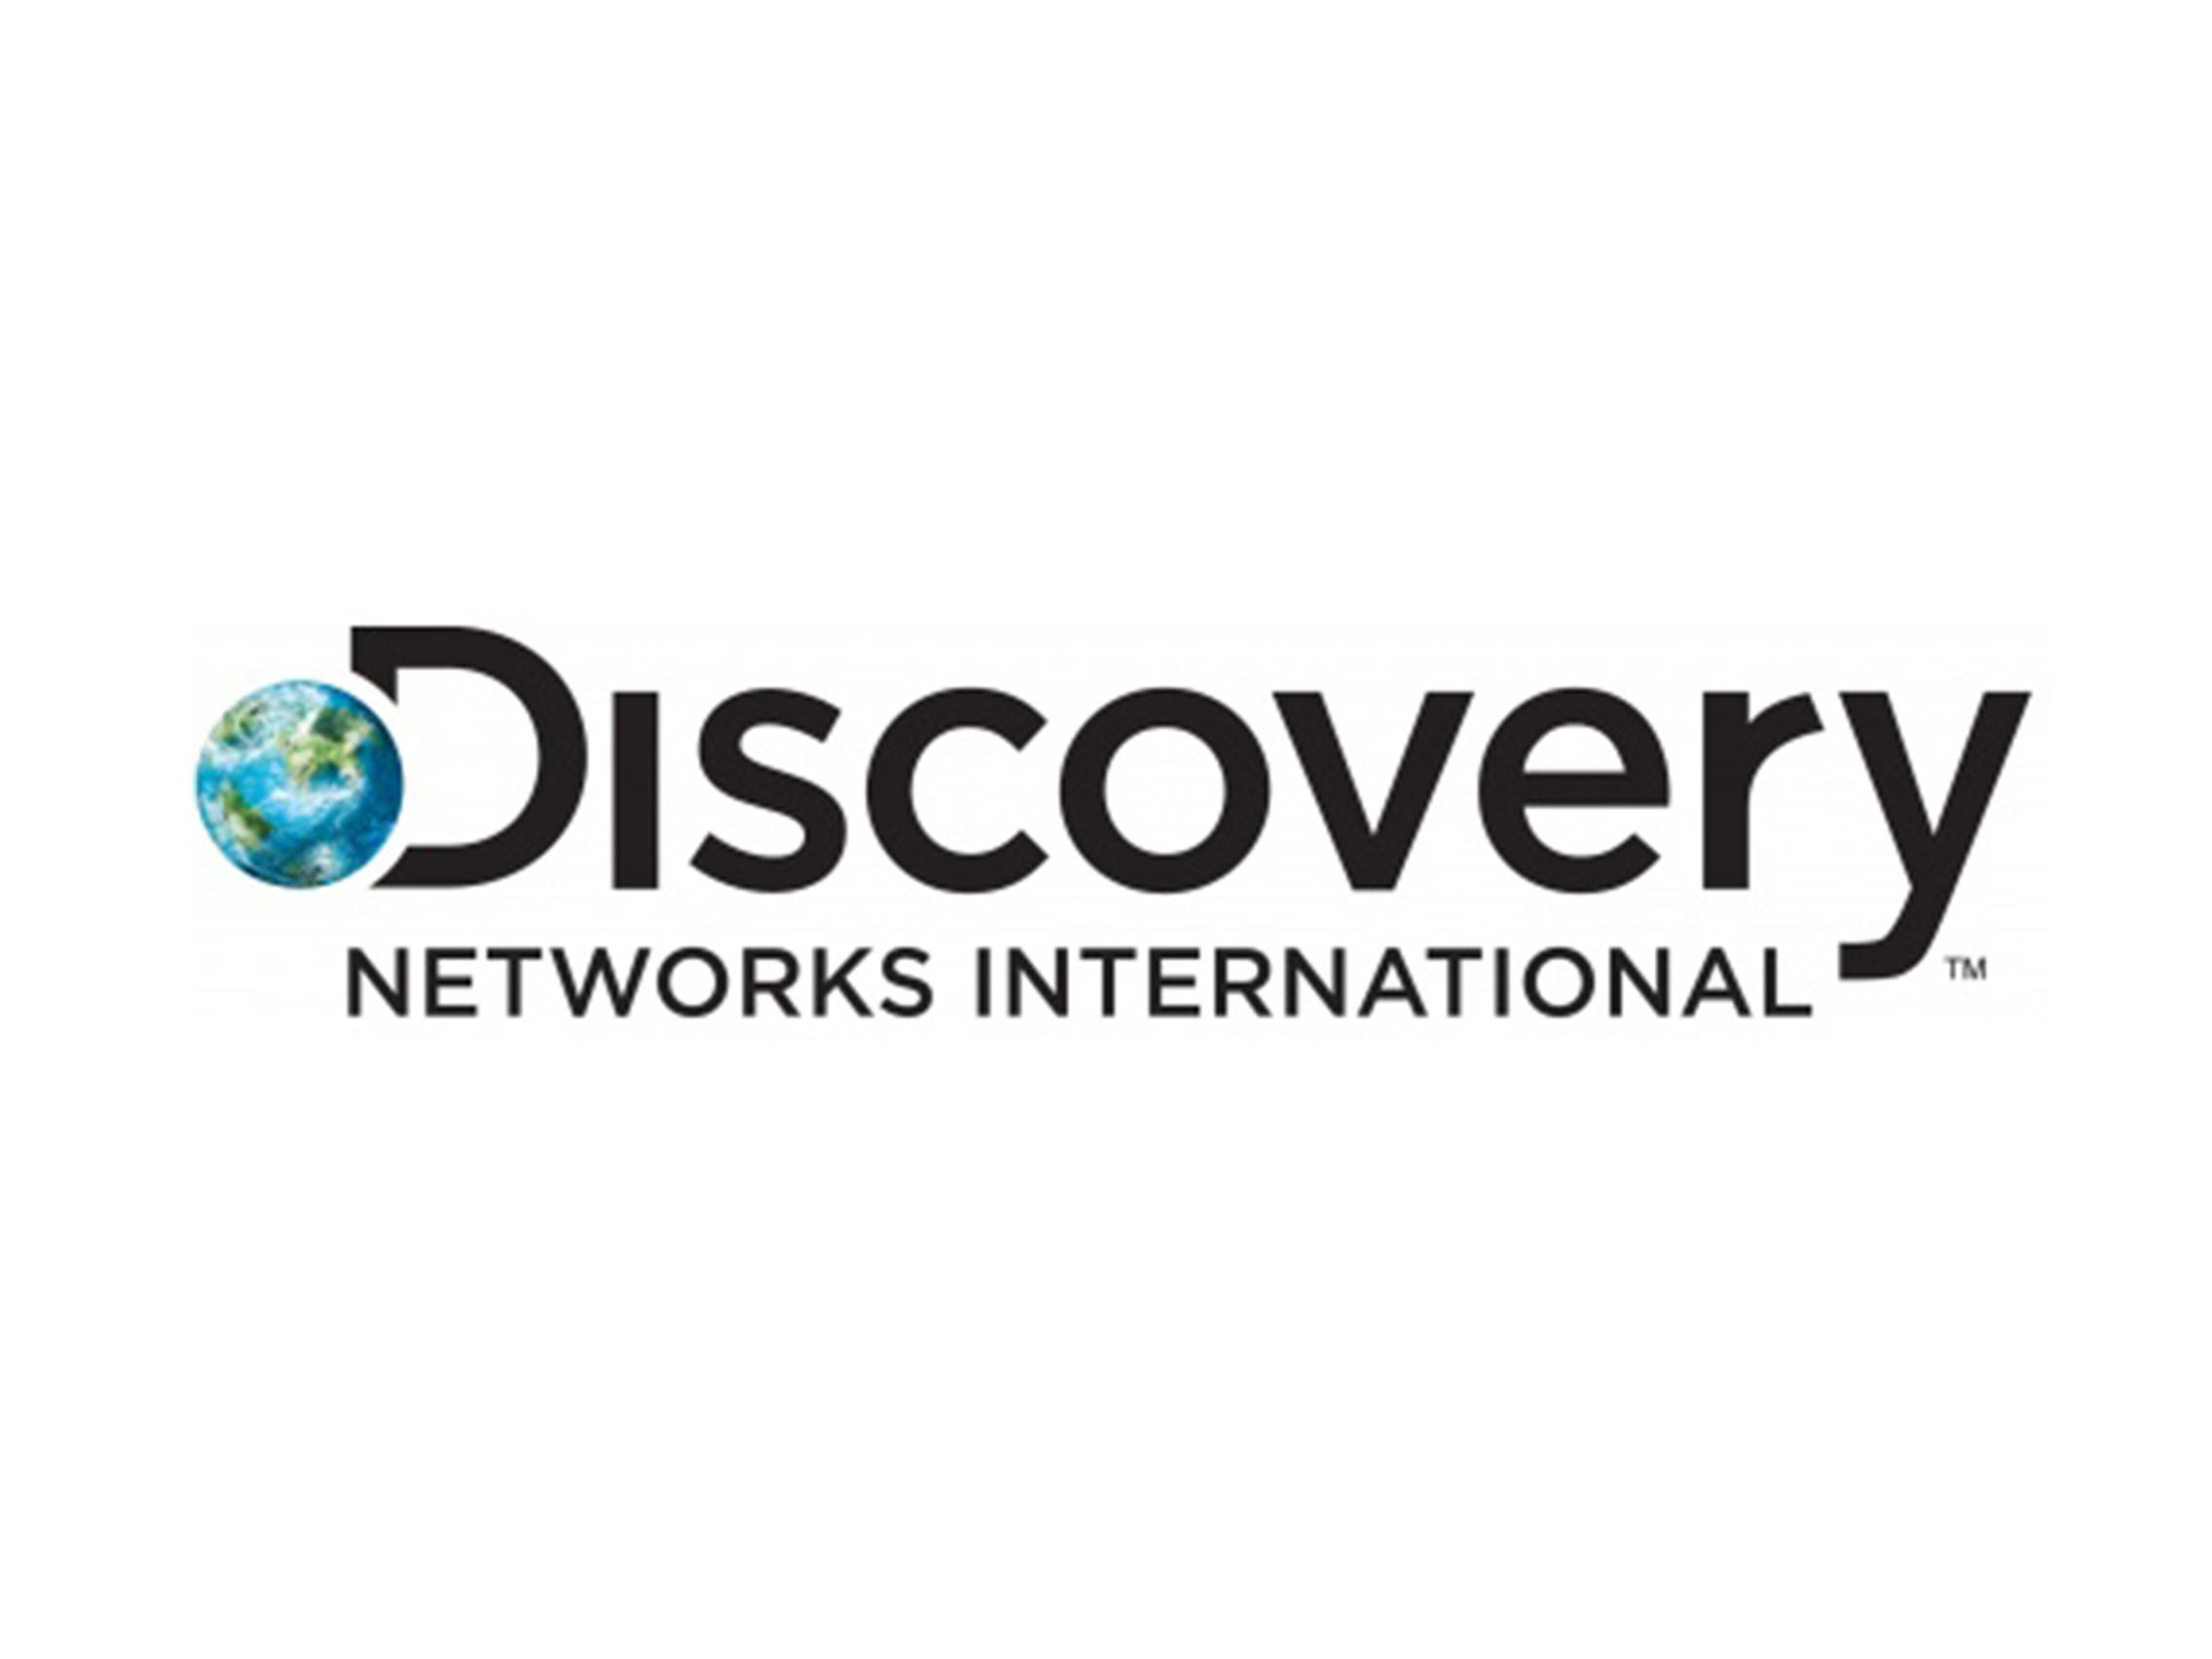 Discovery Intl Logo.jpg